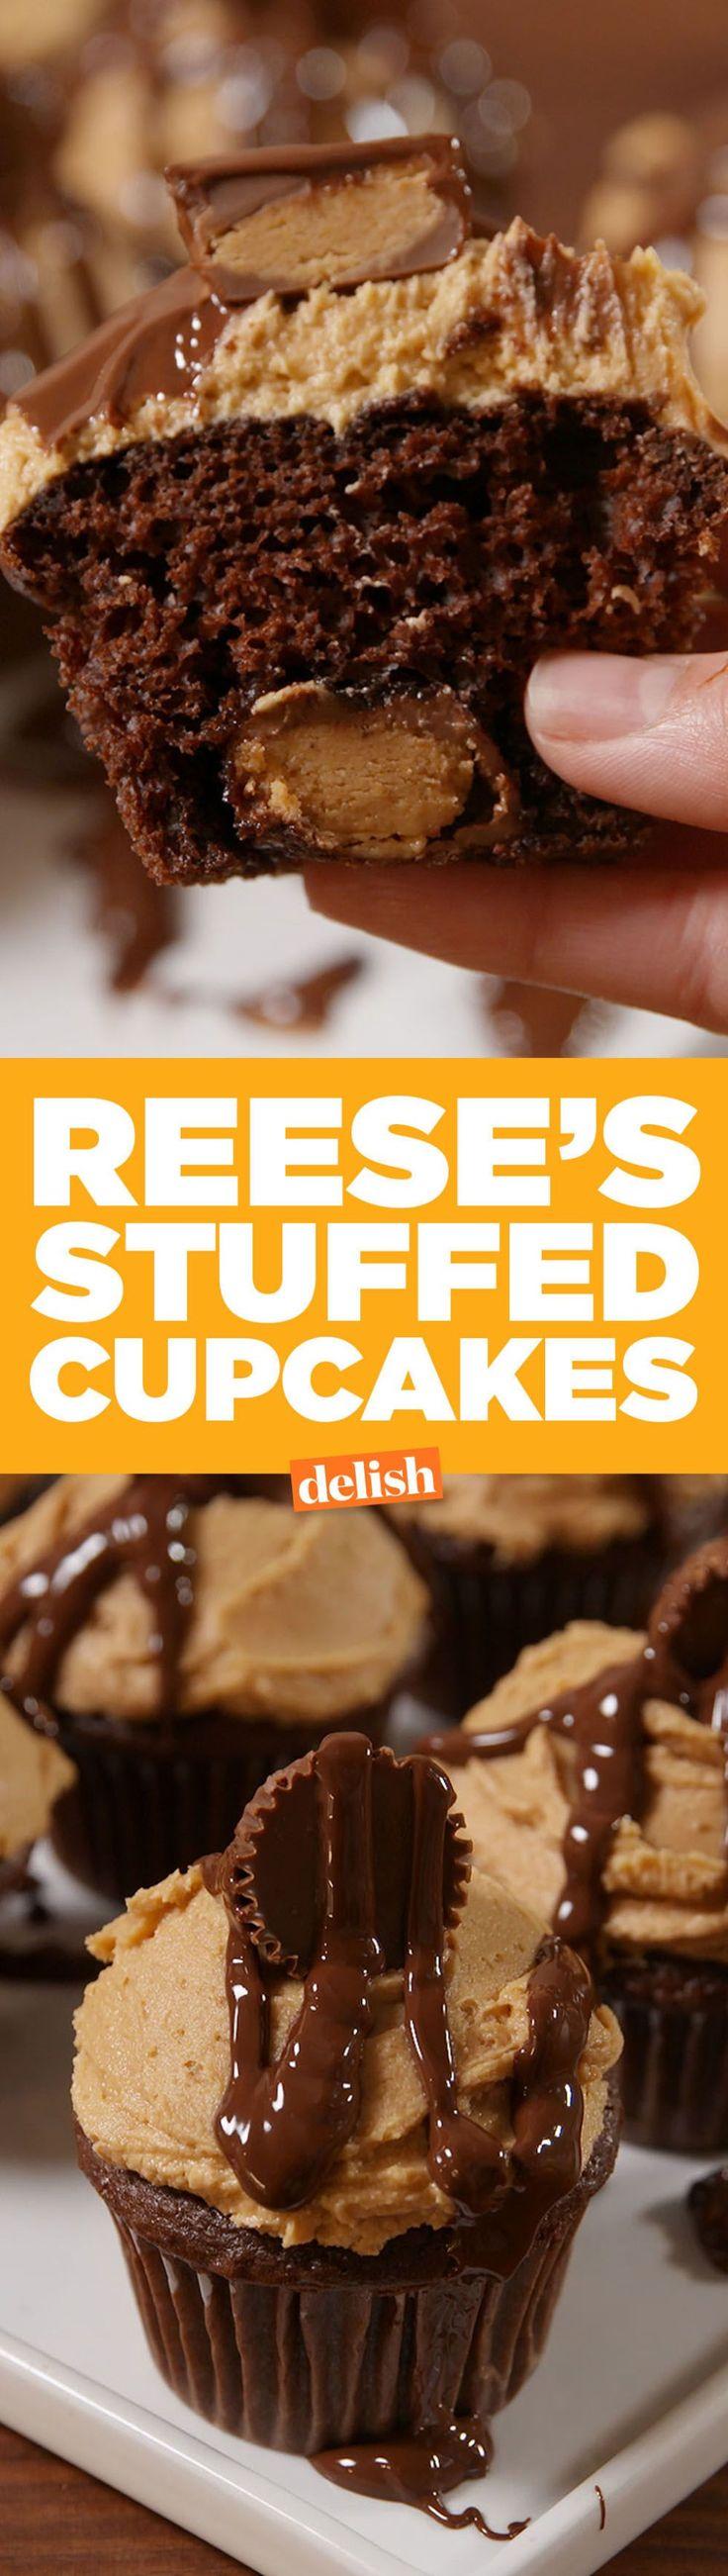 Easy chocolate peanut butter cupcake recipes